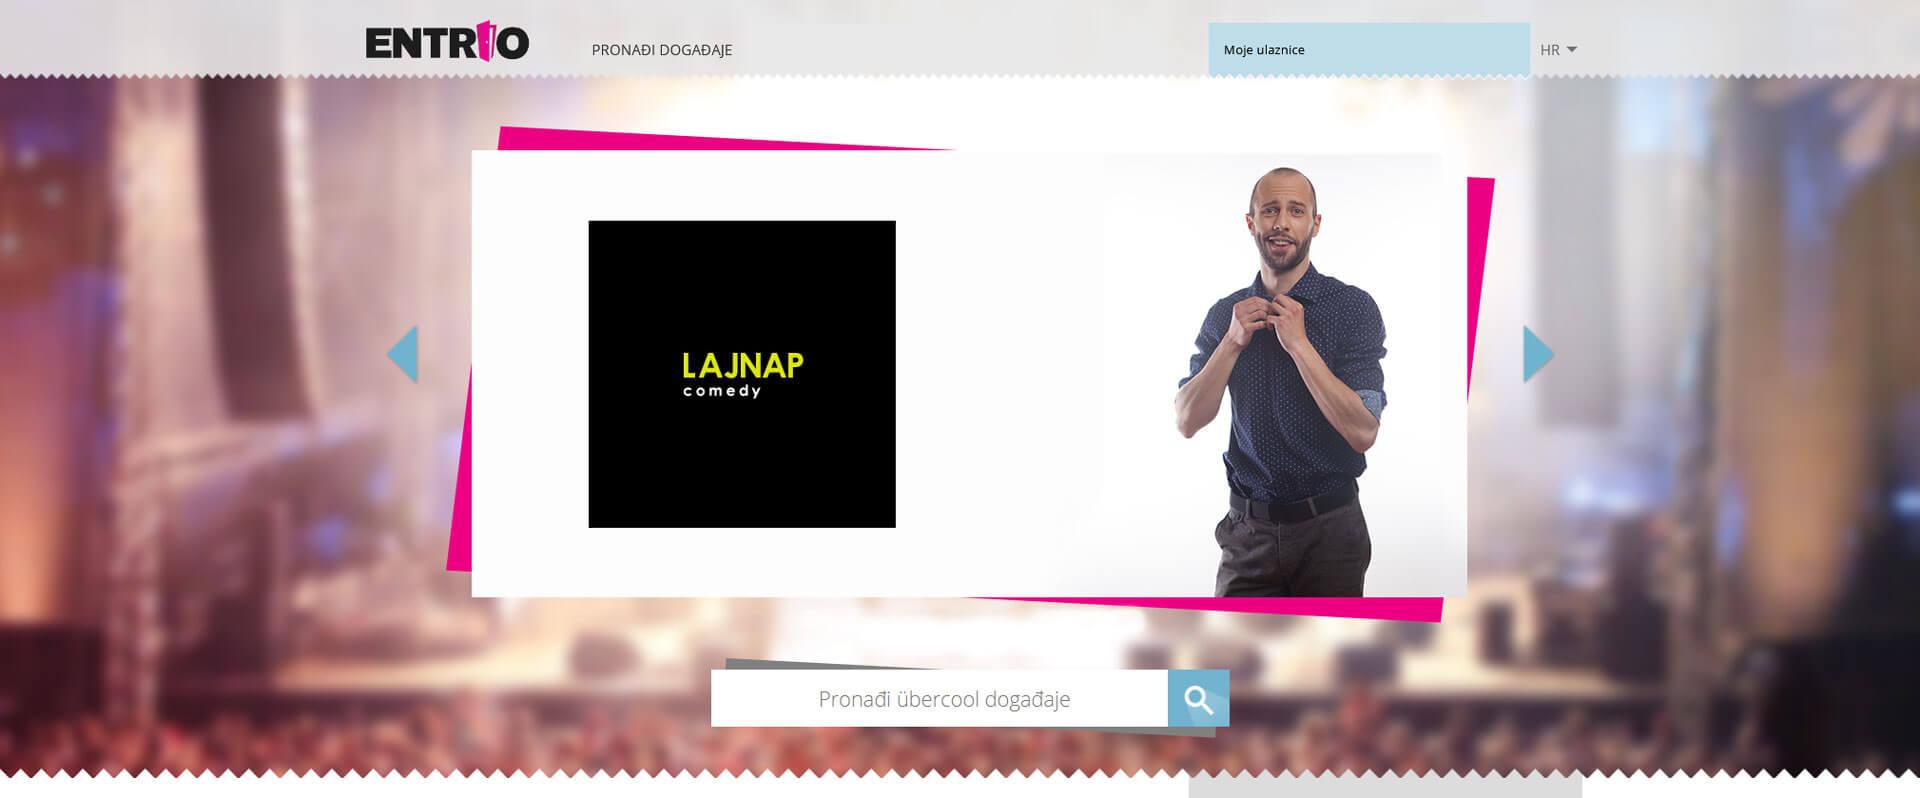 ENTRIO-ULAZNICE-GORAN-WEB-LINK